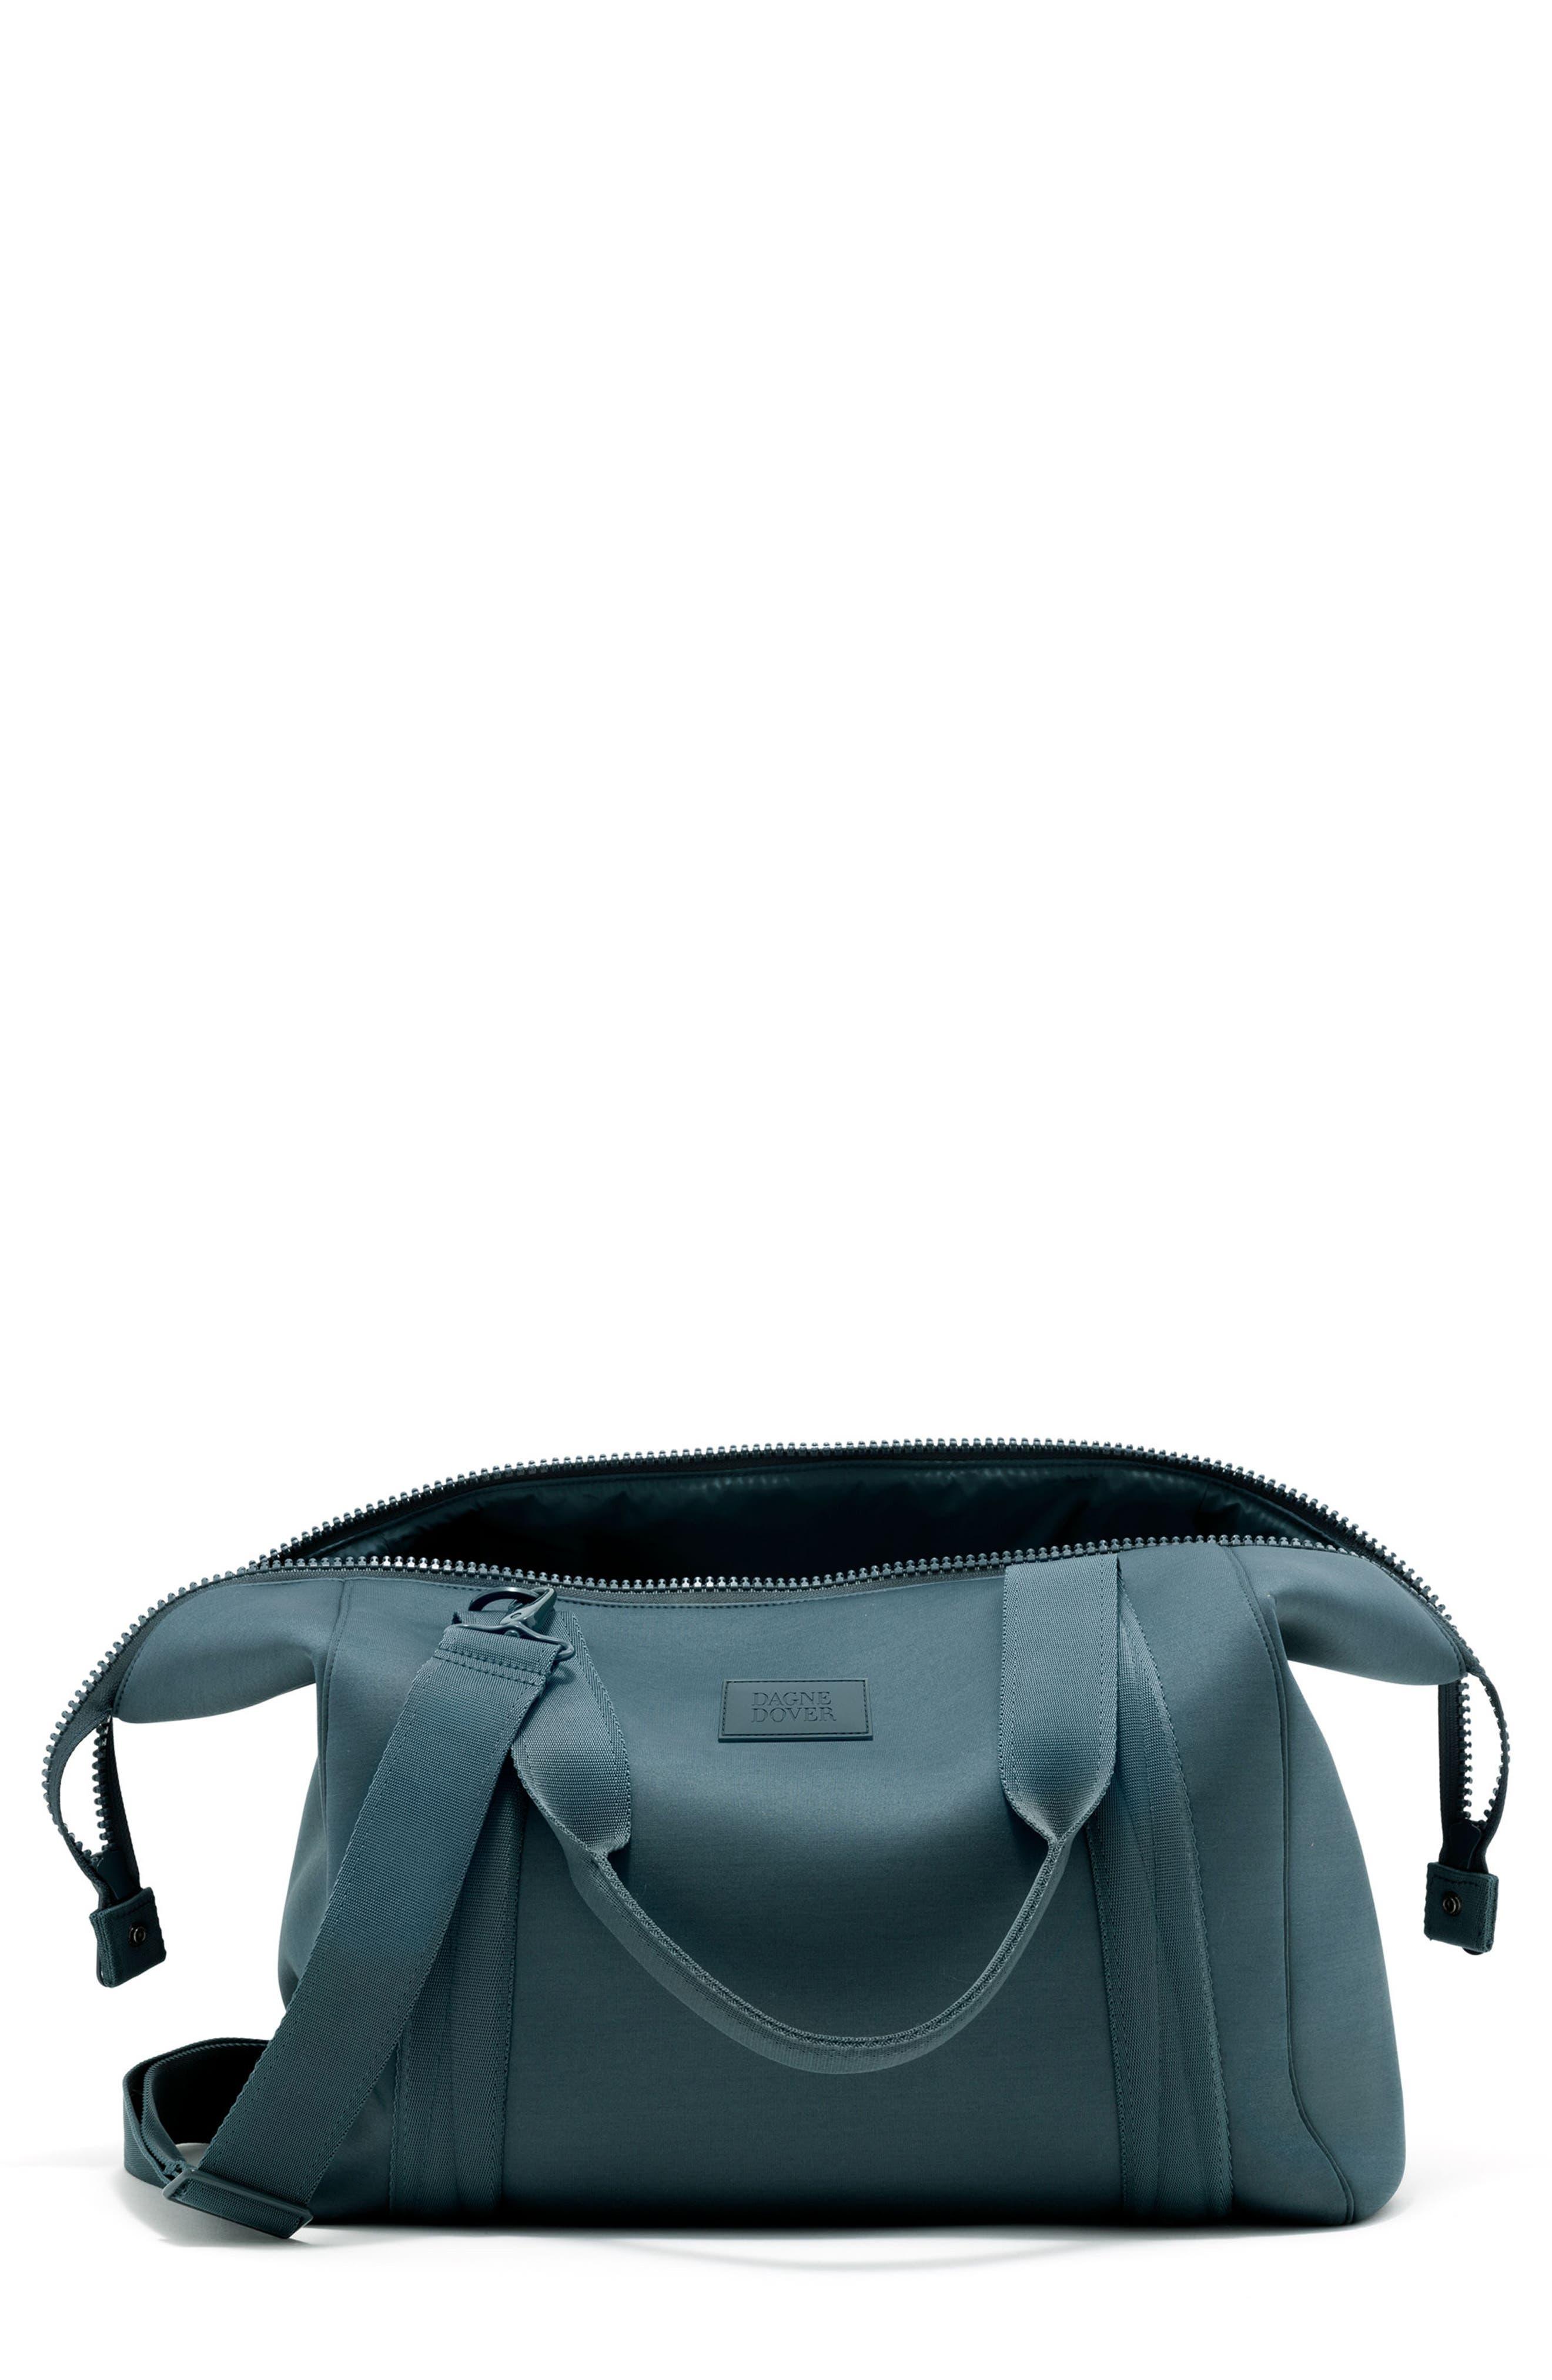 365 Large Landon Neoprene Carryall Duffel Bag,                             Main thumbnail 2, color,